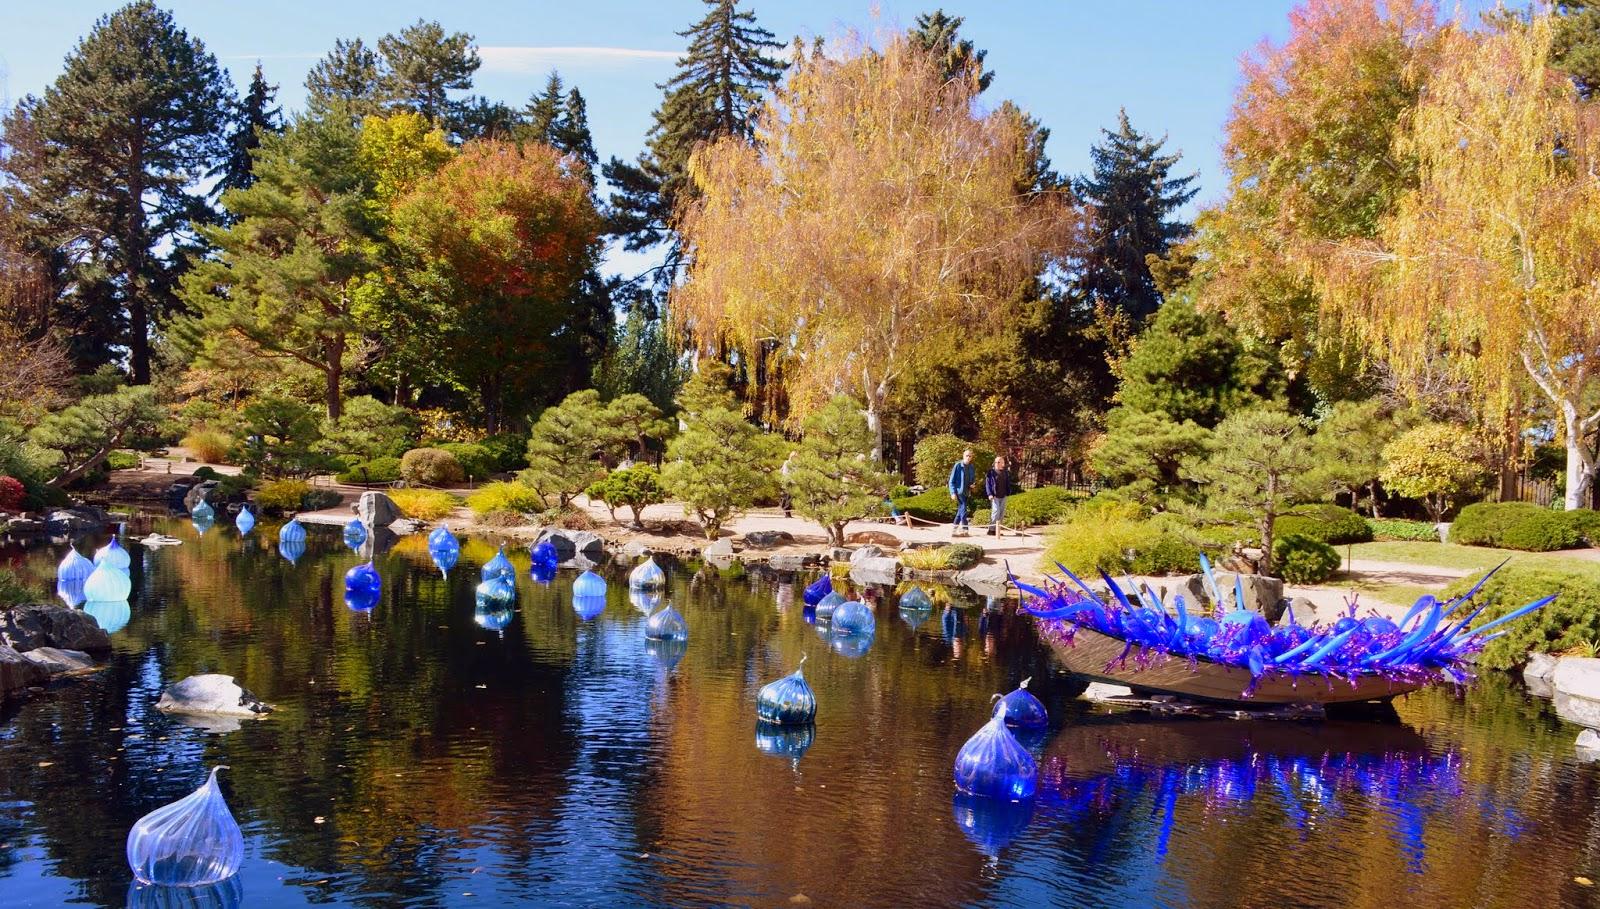 Mille Fiori Favoriti: Chihuly Exhibit at the Denver Botanic Garden